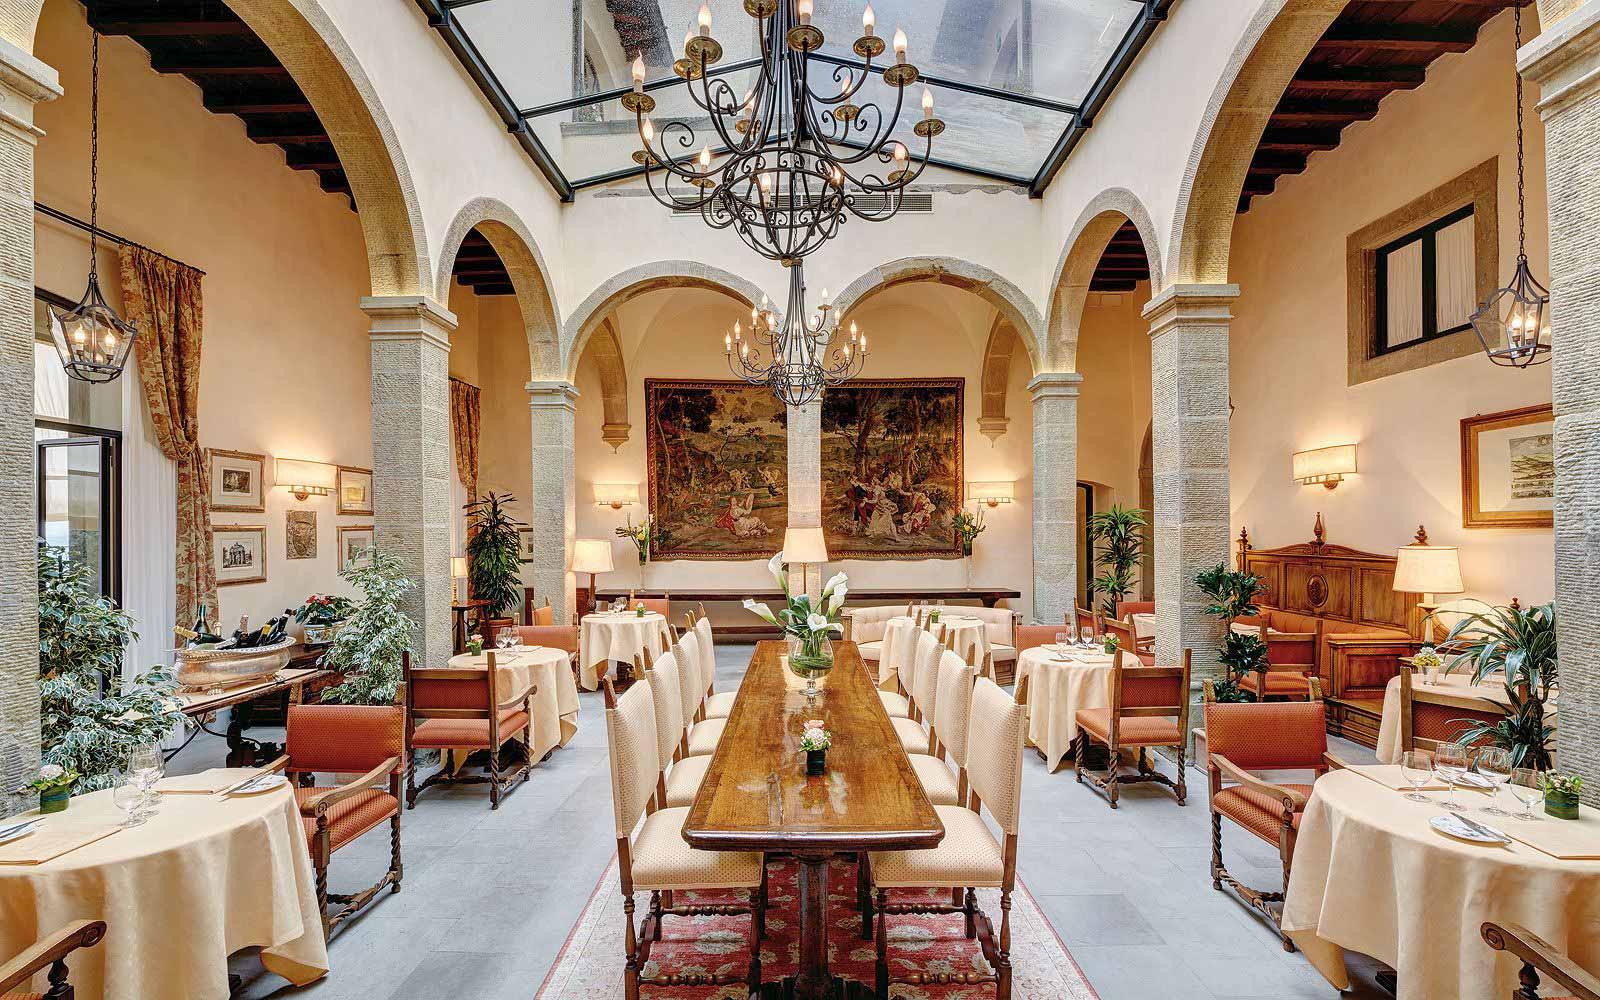 La Loggia Restaurant at Belmond Villa San Michele